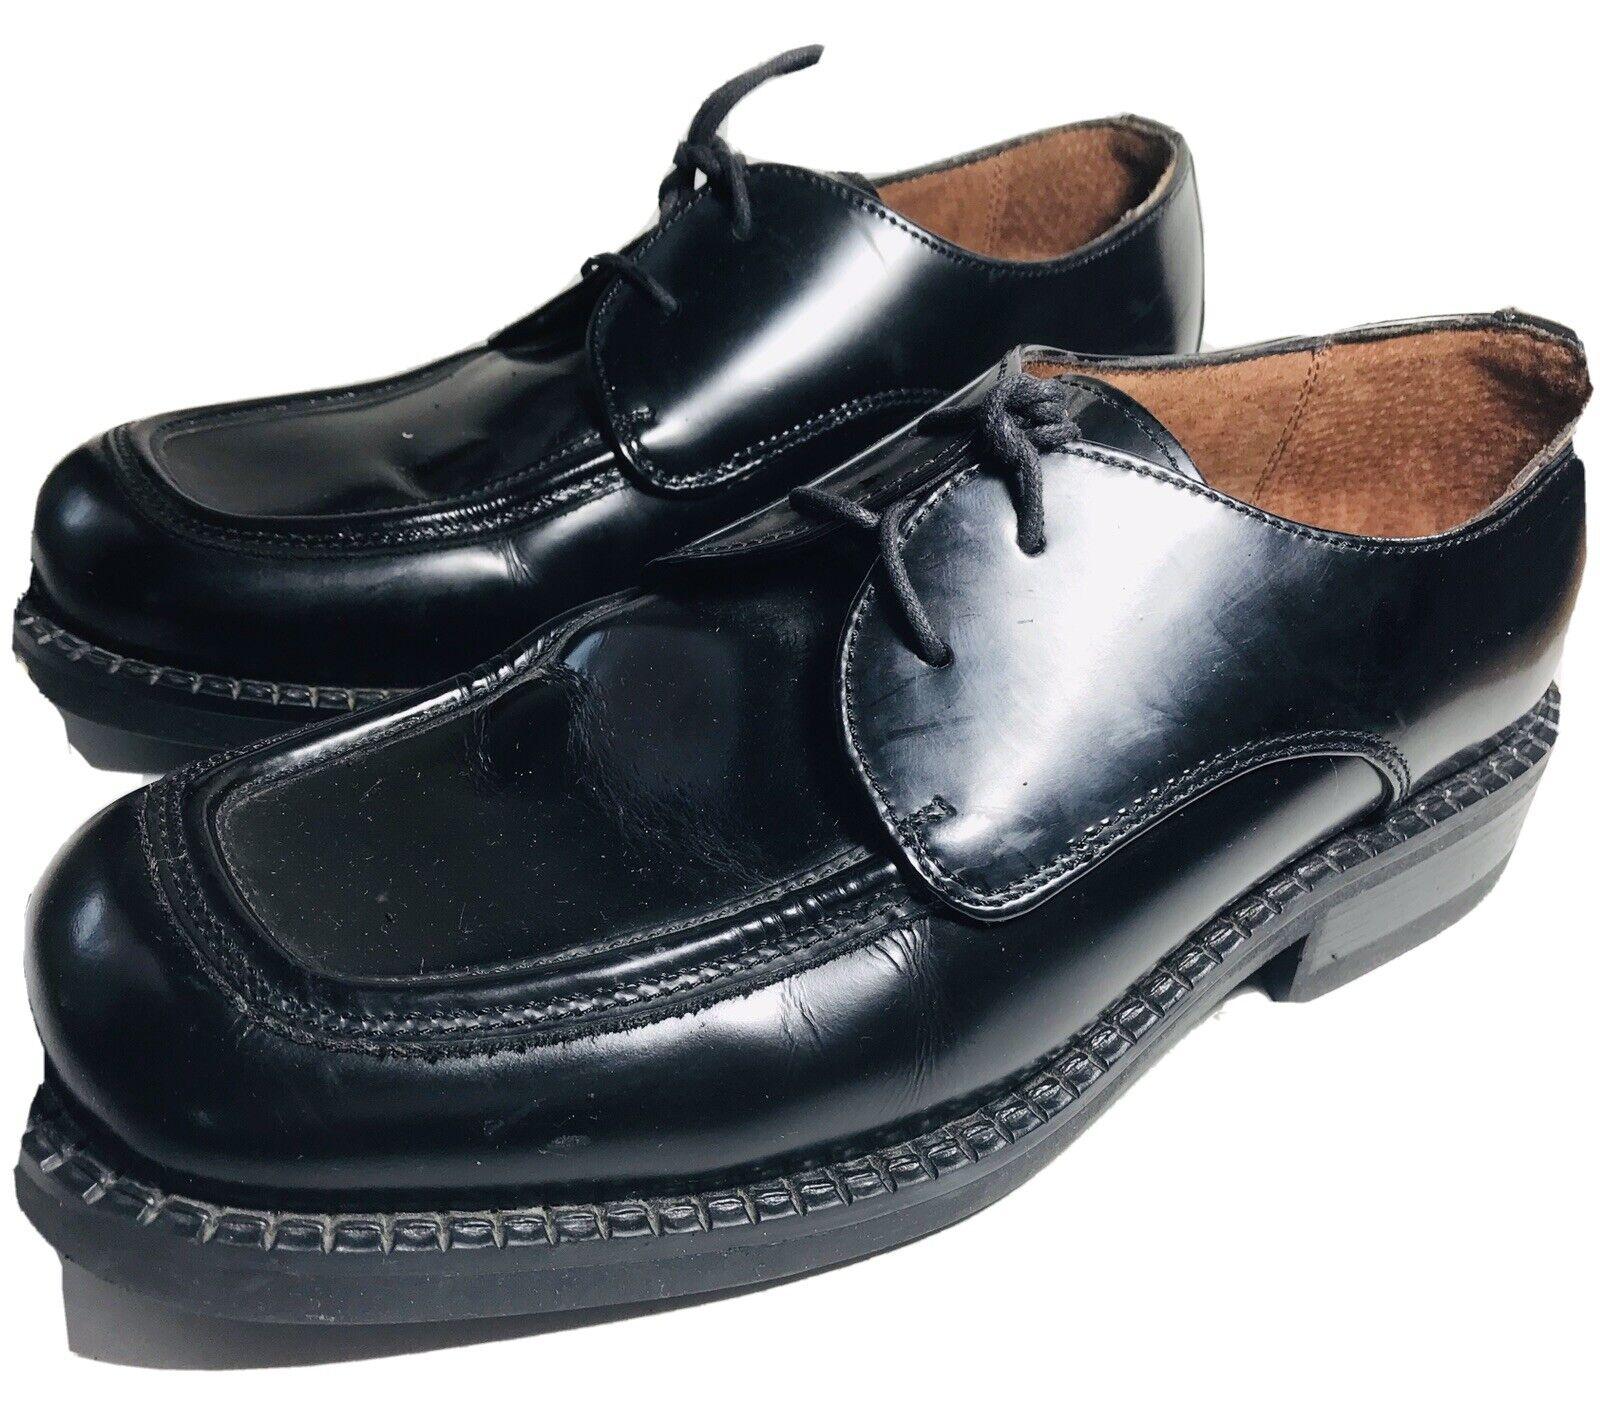 Reaction Kenneth Cole Men's Size 9 Black Leather Oxford Dress Shoes